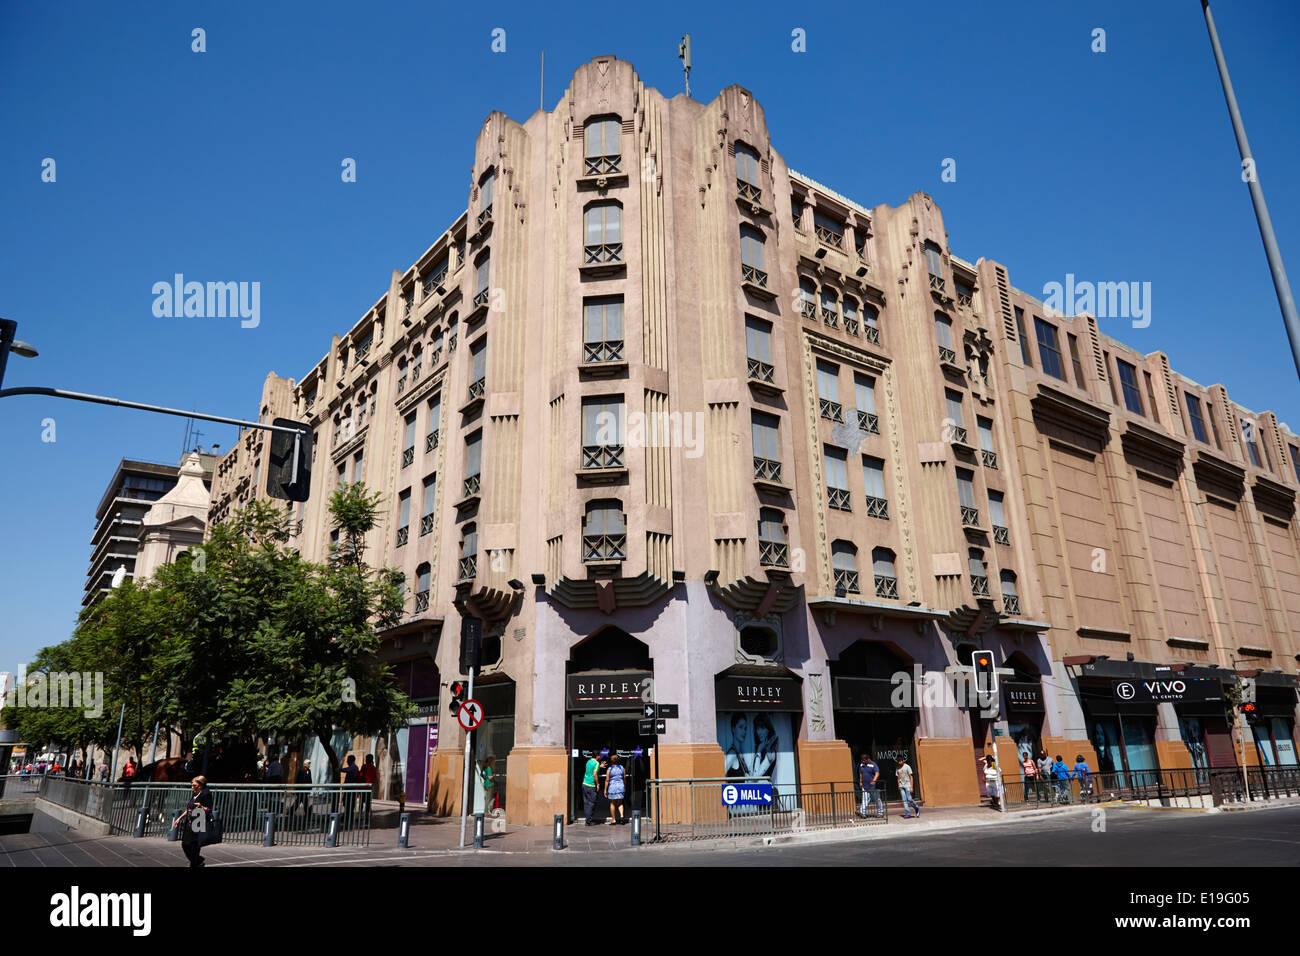 ripley department store in vivo el centro mall downtown Santiago Chile Stock Photo